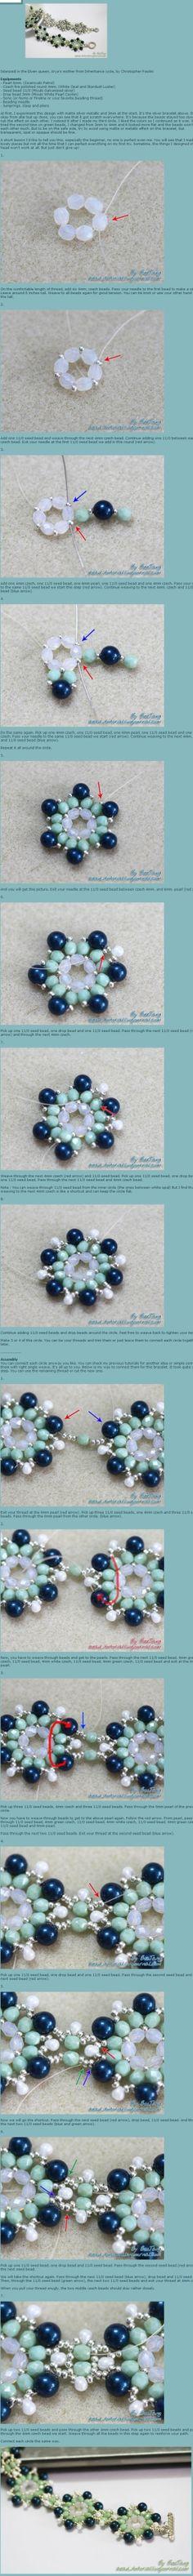 flower bracelet tutorial by Riamerc